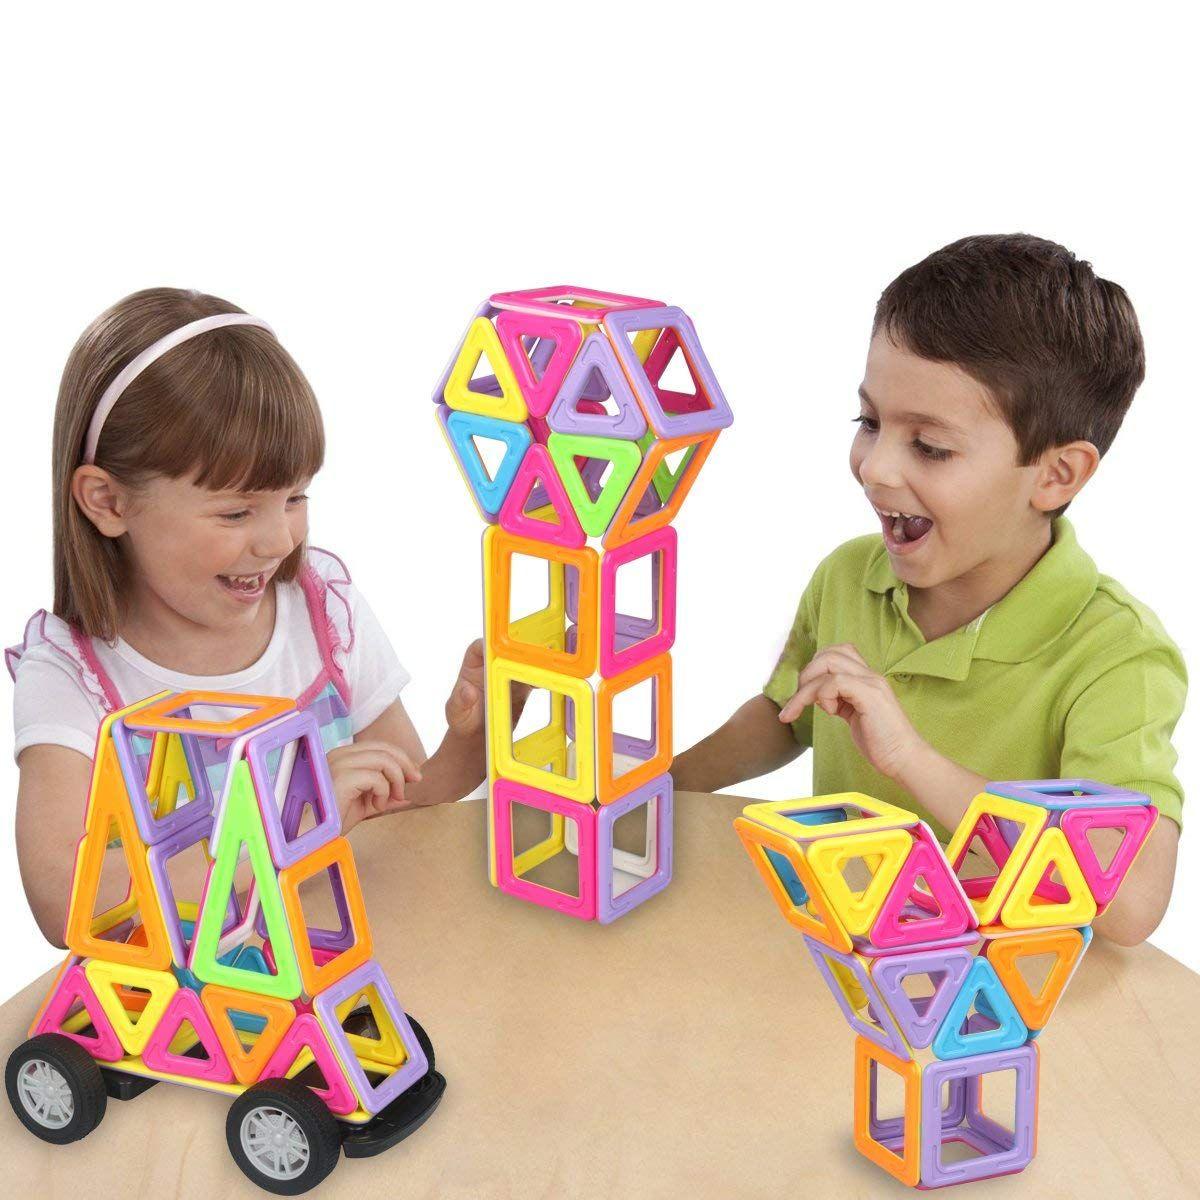 77 Pcs Magnetic Building Blocks Construction Set Toys And